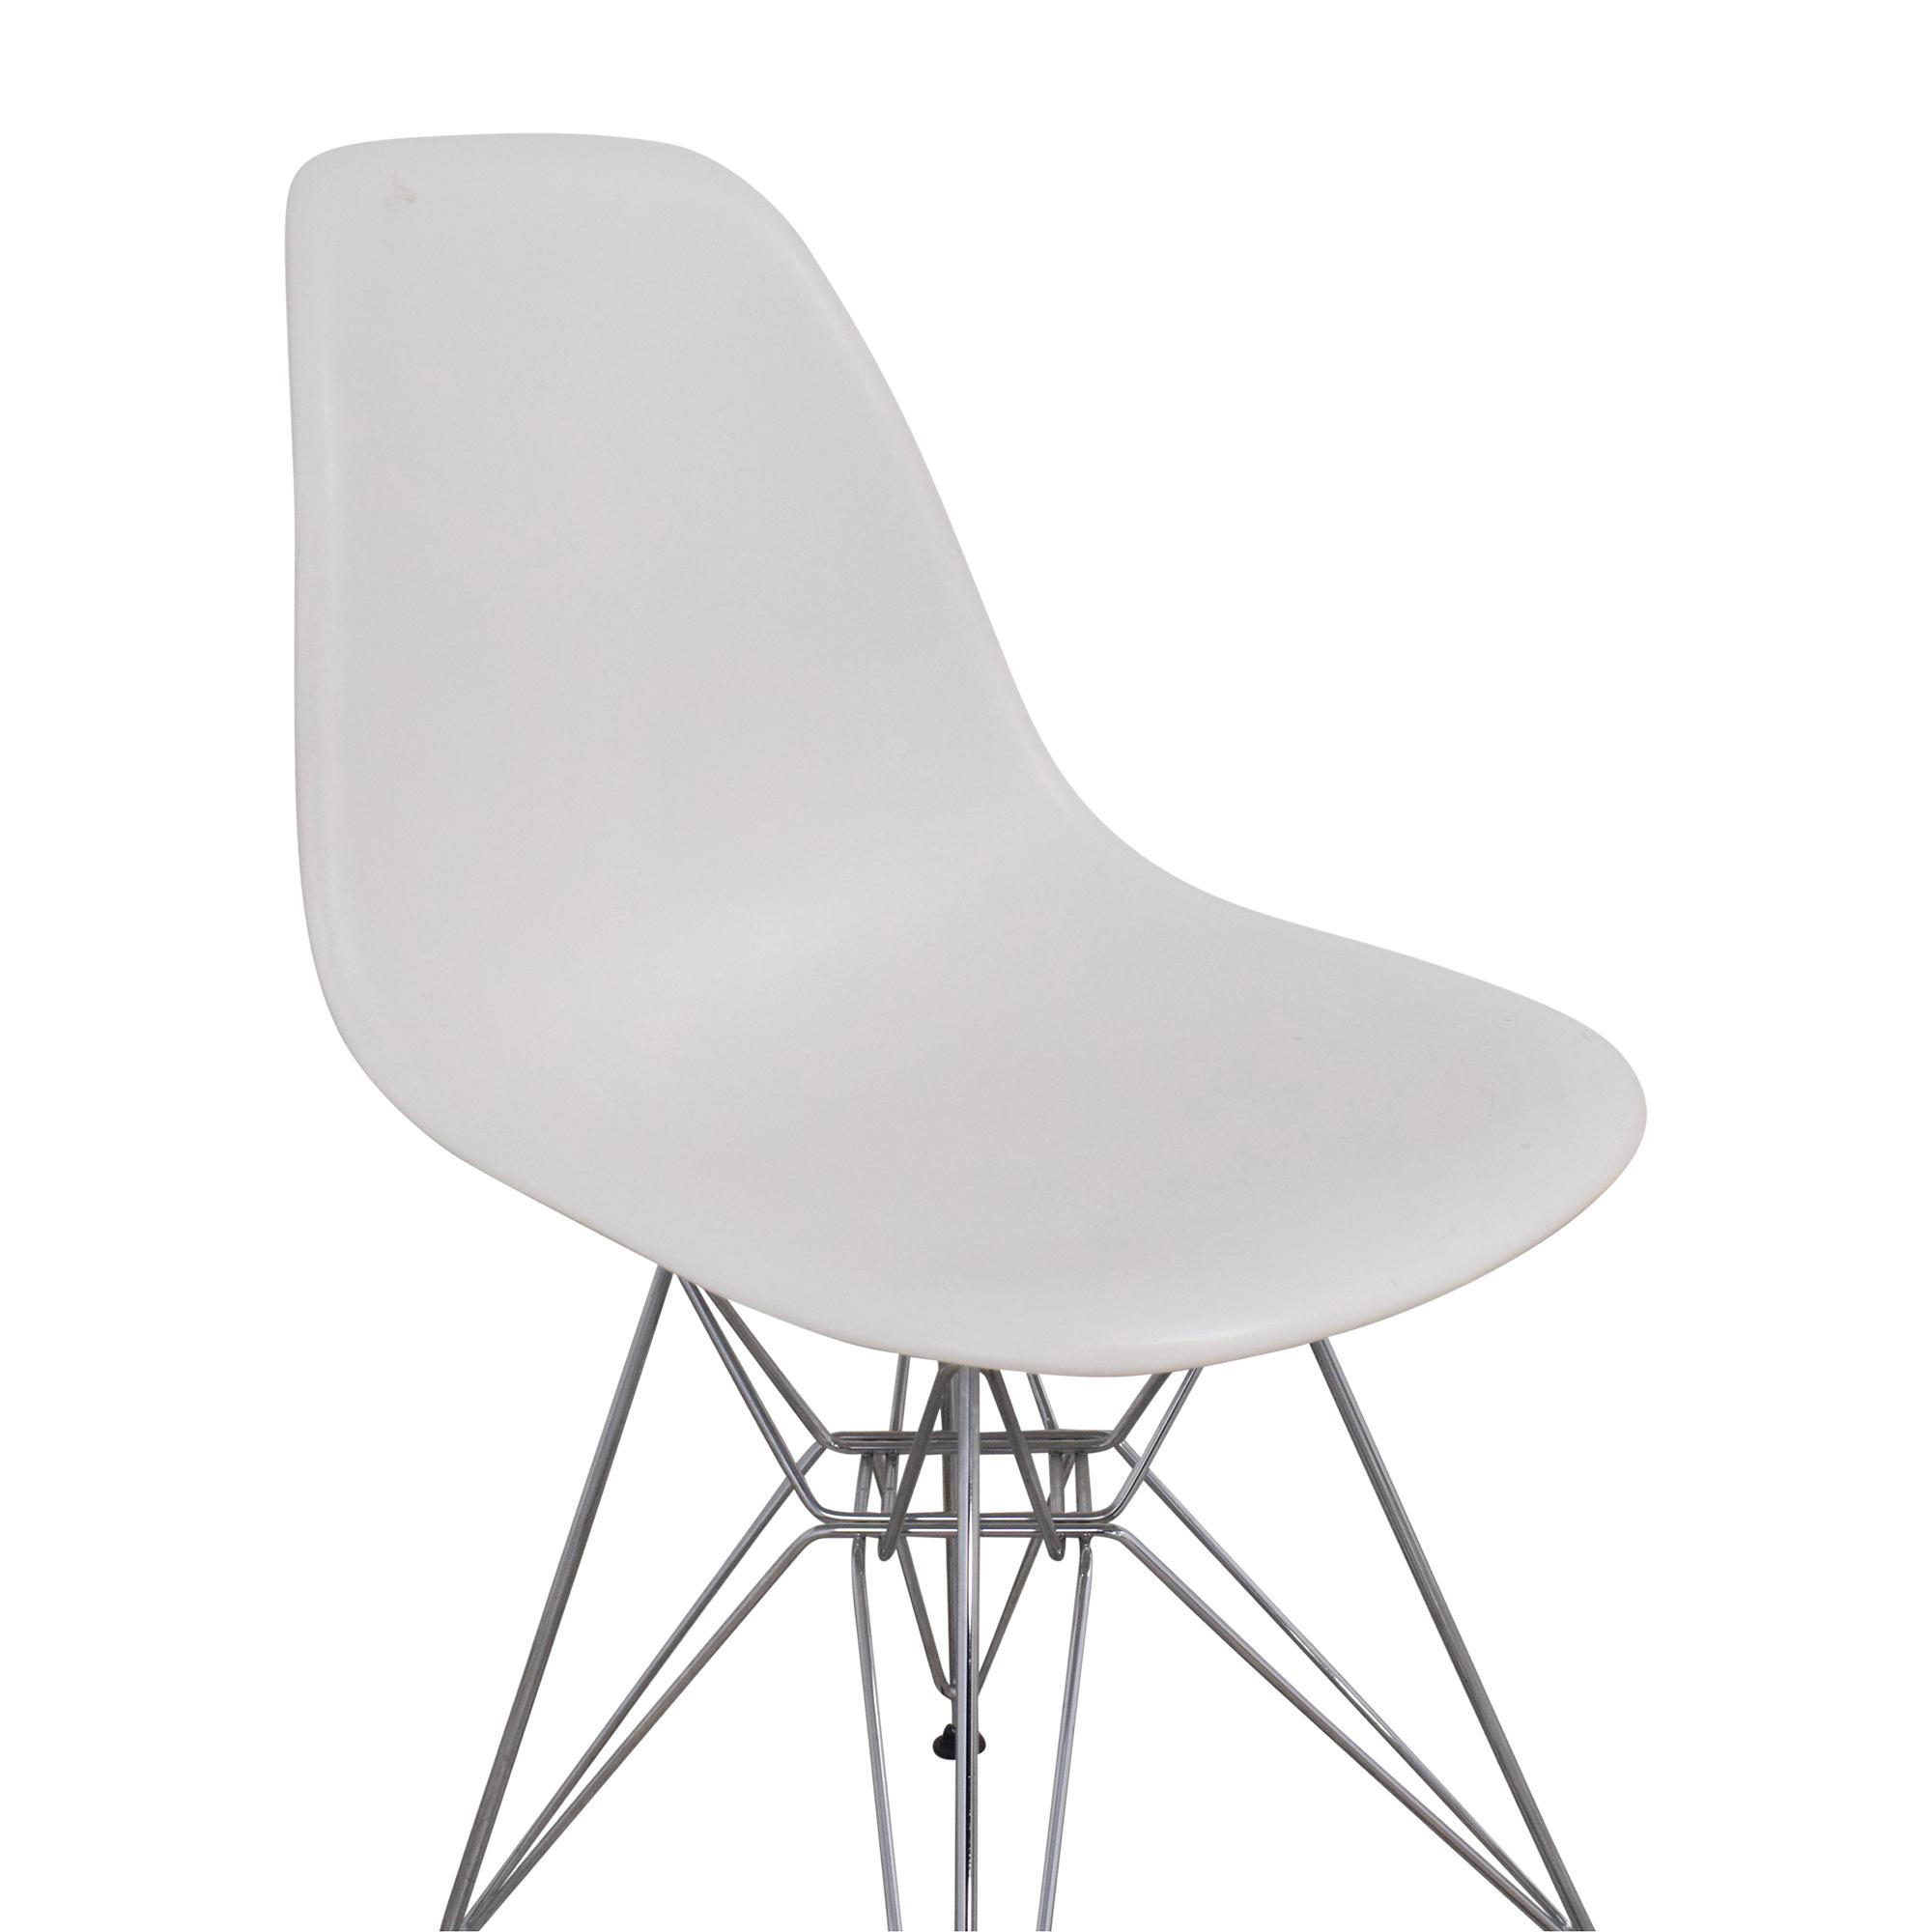 Herman Miller Herman Miller Eames Molded Side Chair for sale